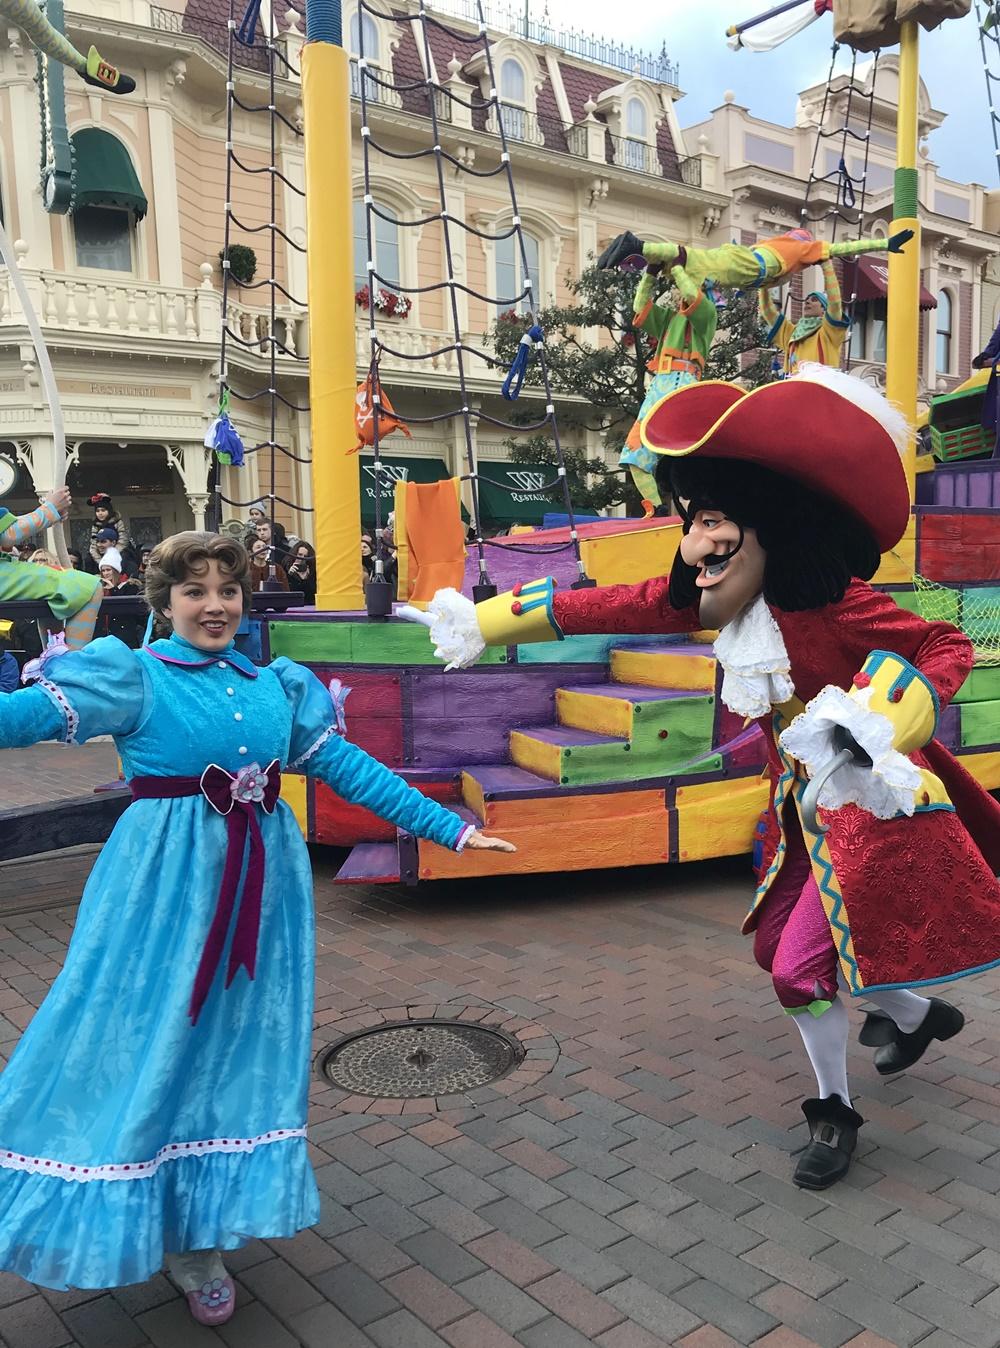 Saison Disney Disneyland Paris Pirates Princesses Festival